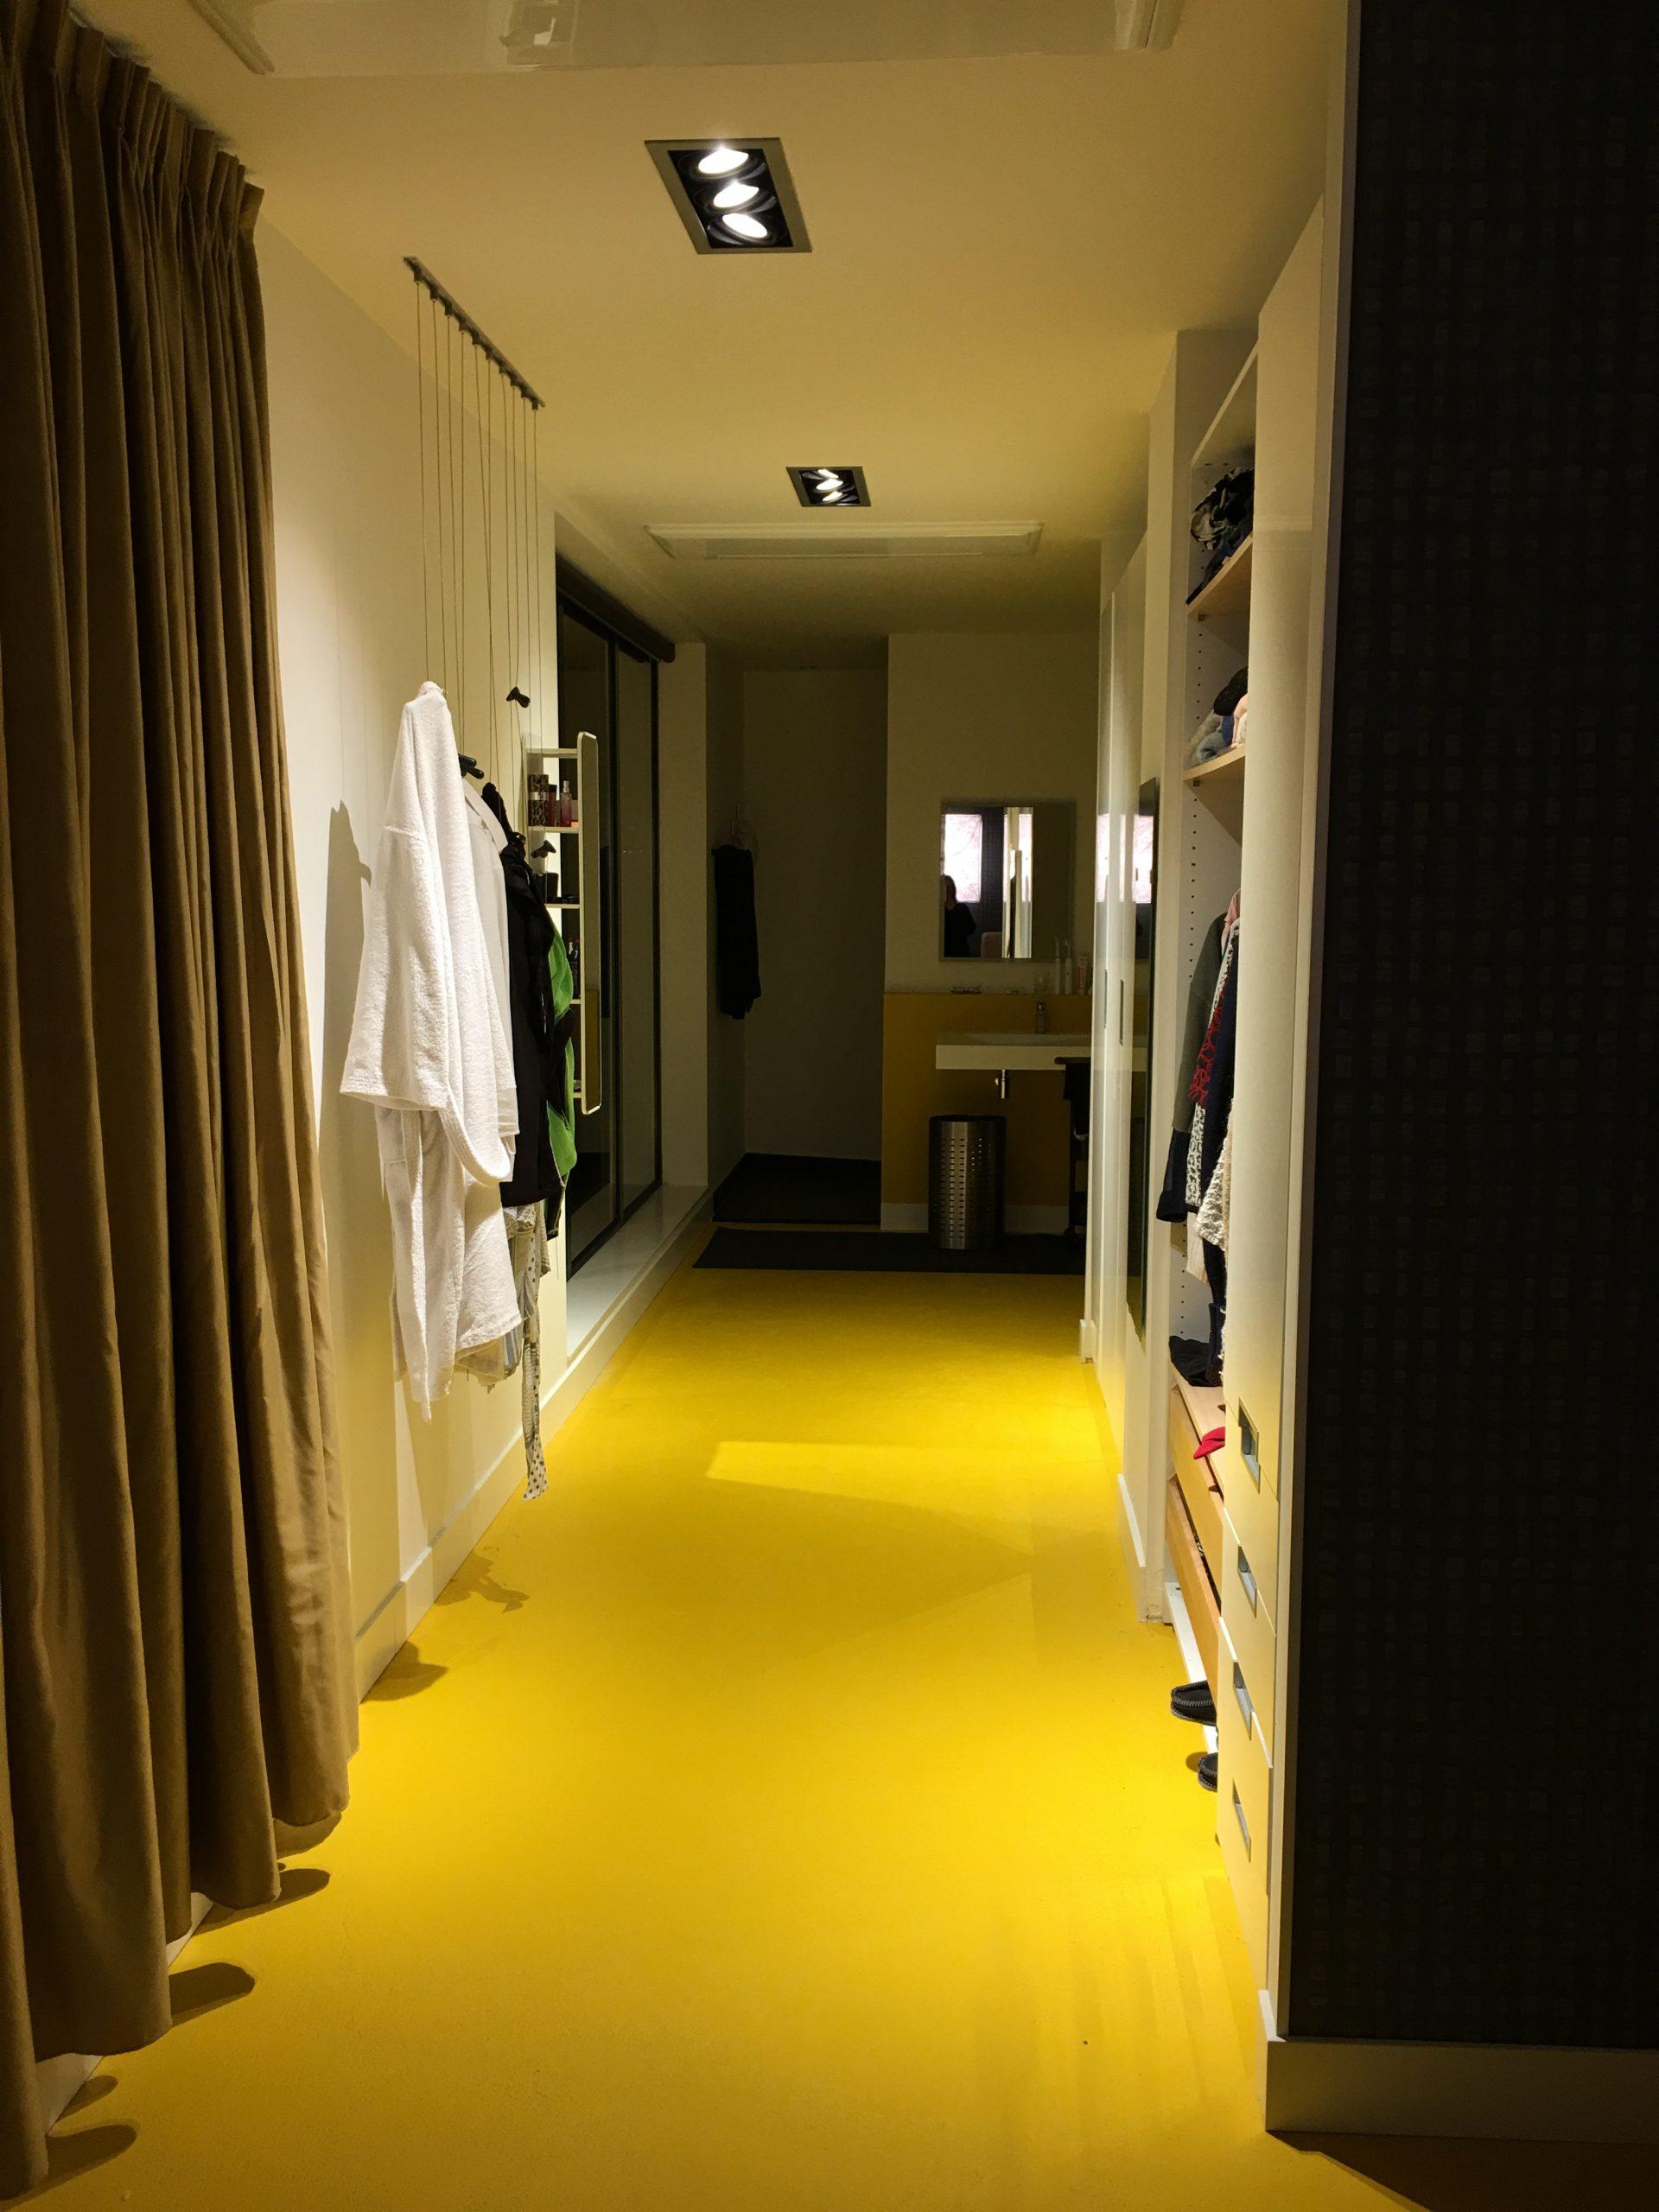 ons penthouse, de kleedkamer